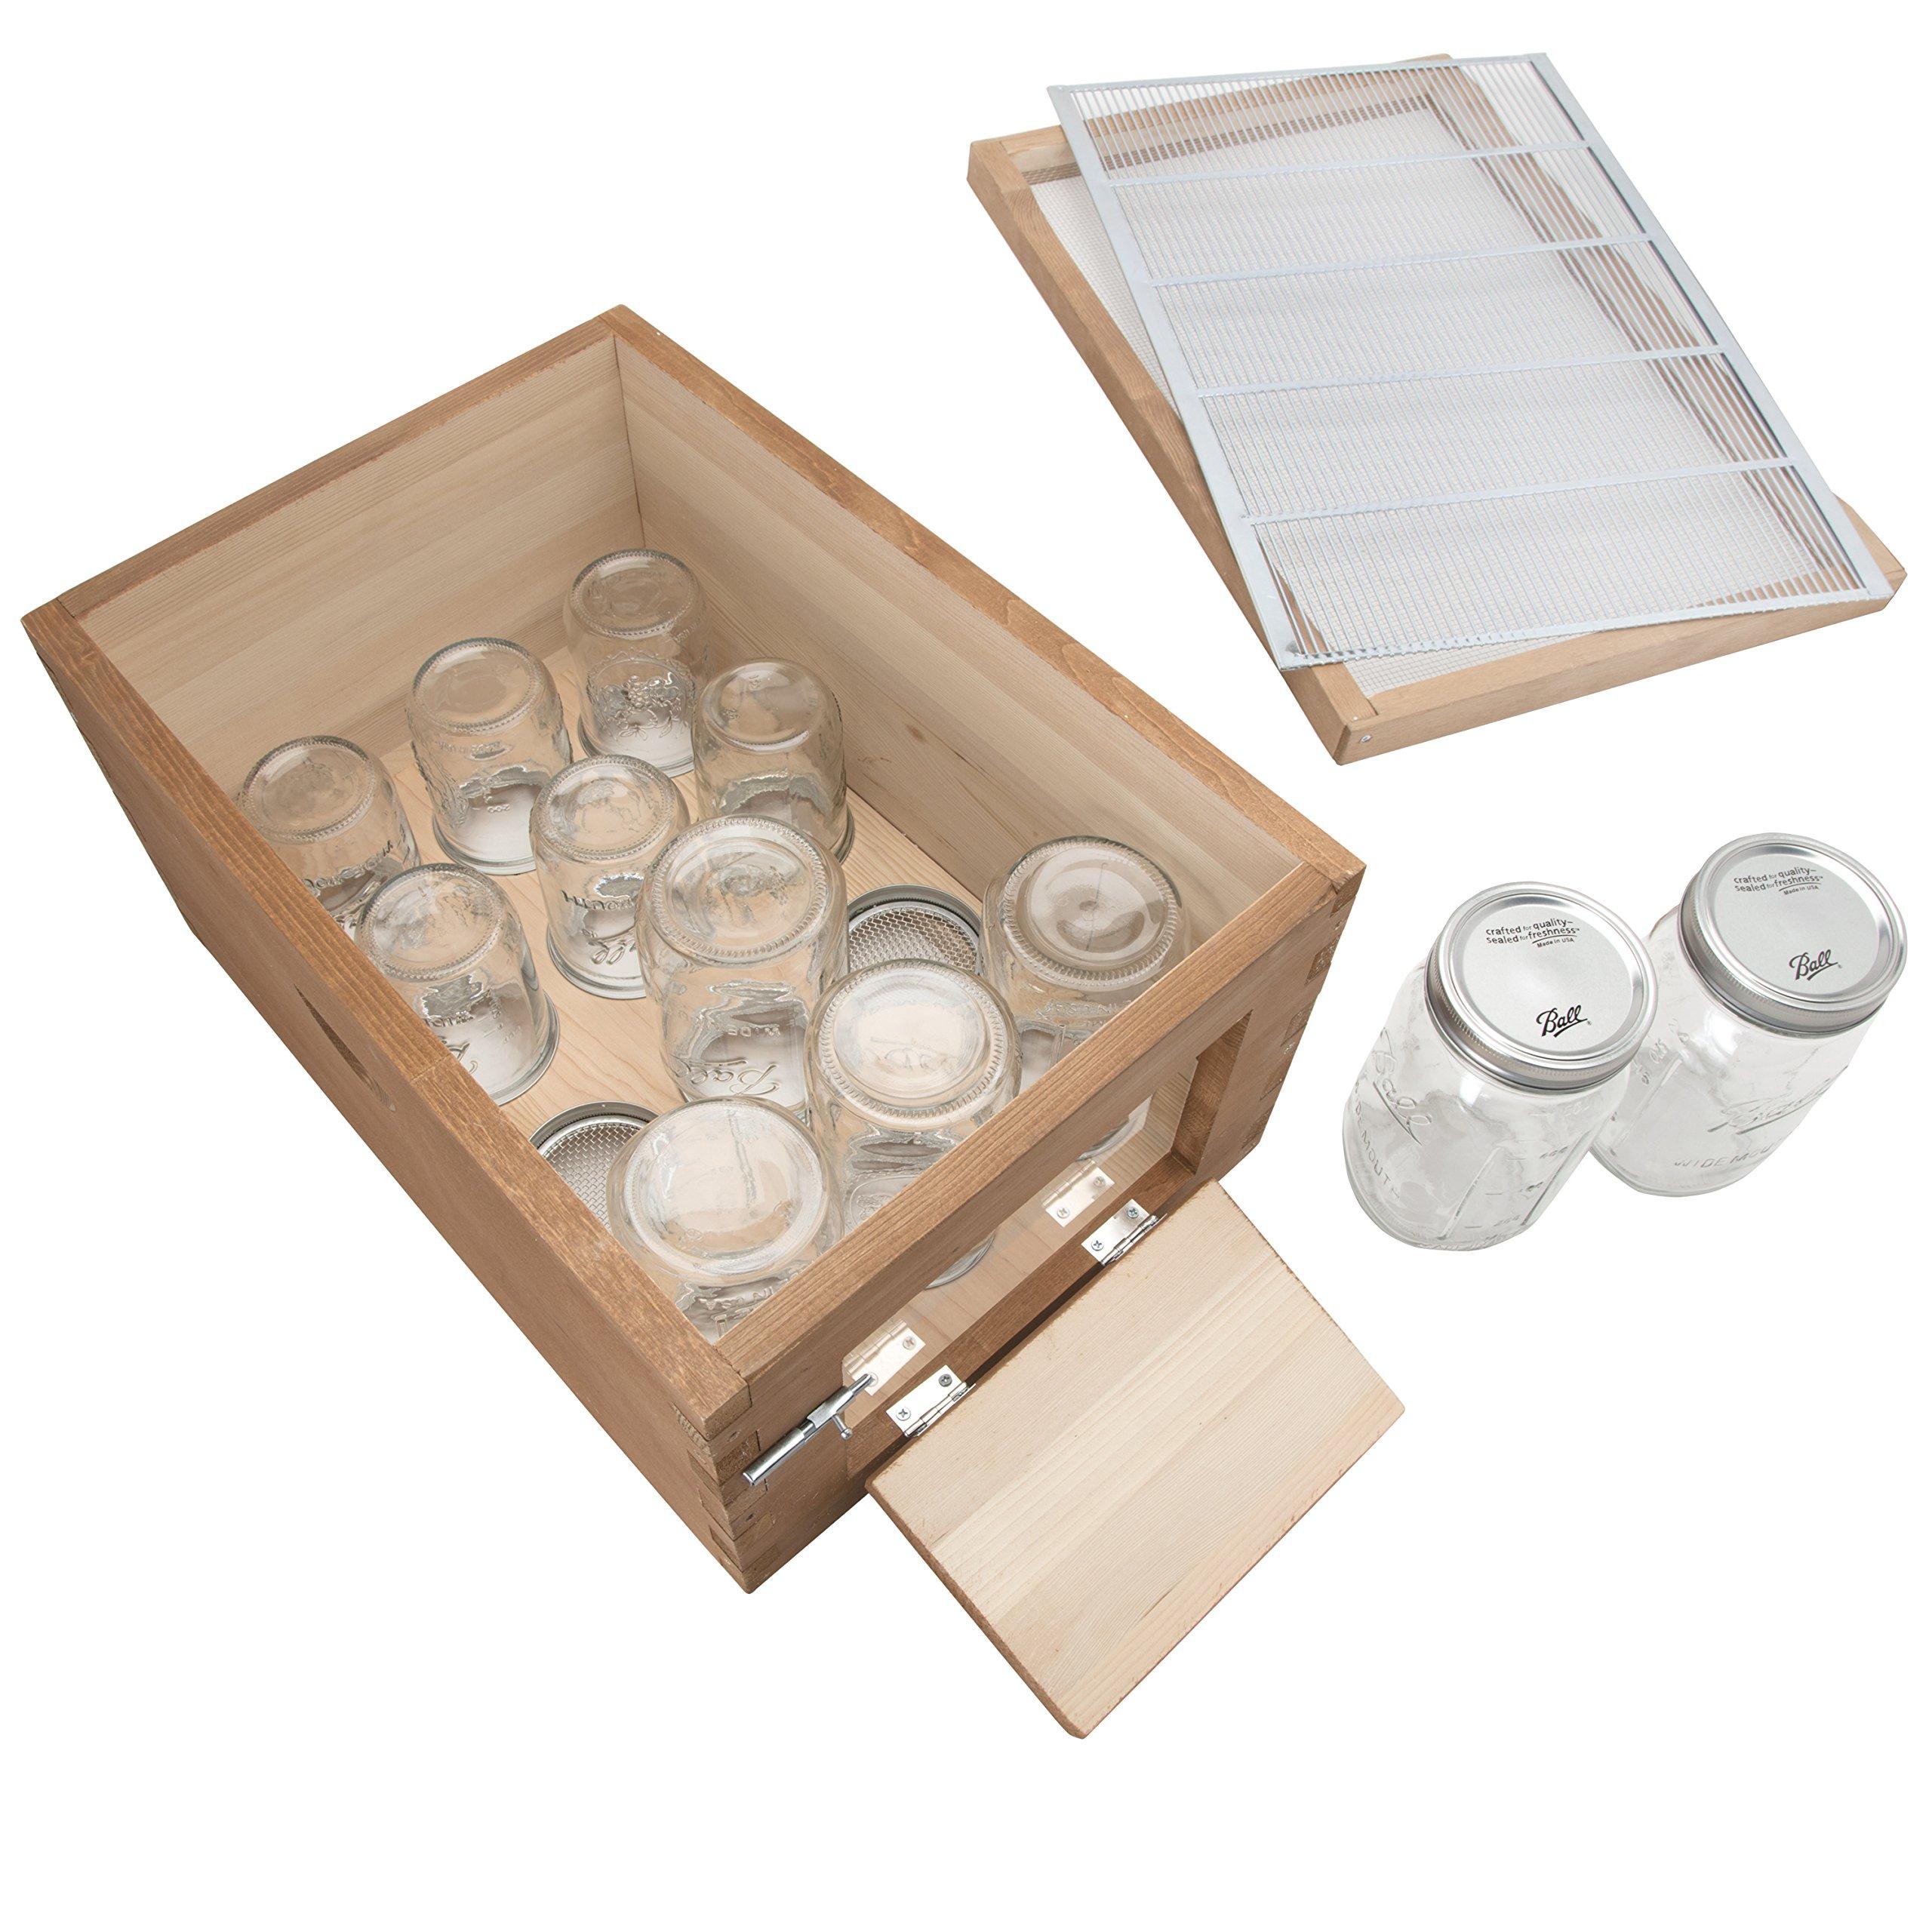 SummerHawk Ranch Jar Super 3-YEAR Warranty, with Innovative Honey Harvesting System, Storing Honey directly in Mason Jars, Backyard Bee Hive Extension, Beekeeping Equipment